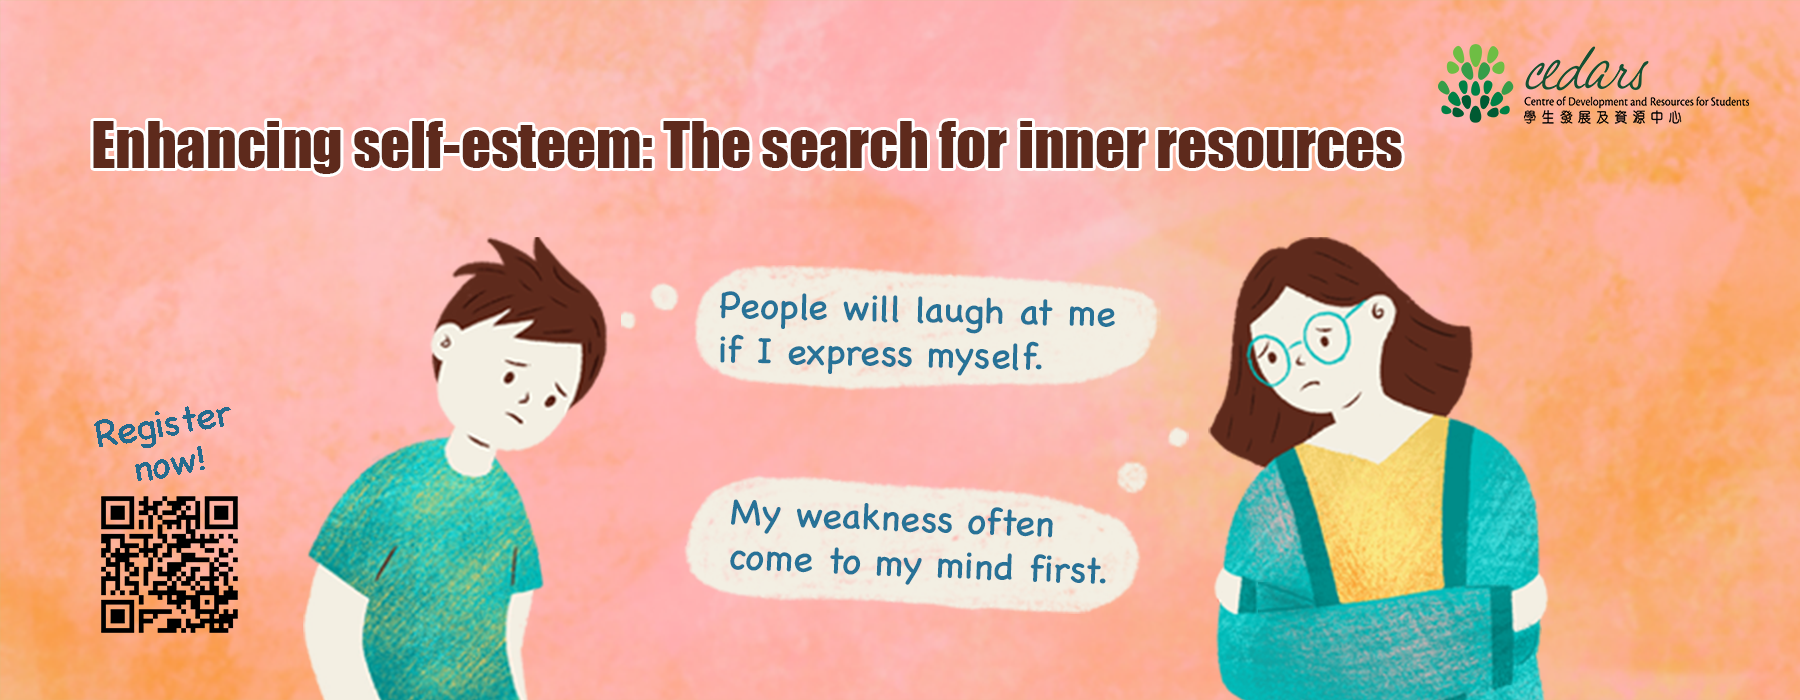 Enhancing Your Self-esteem - Workshop